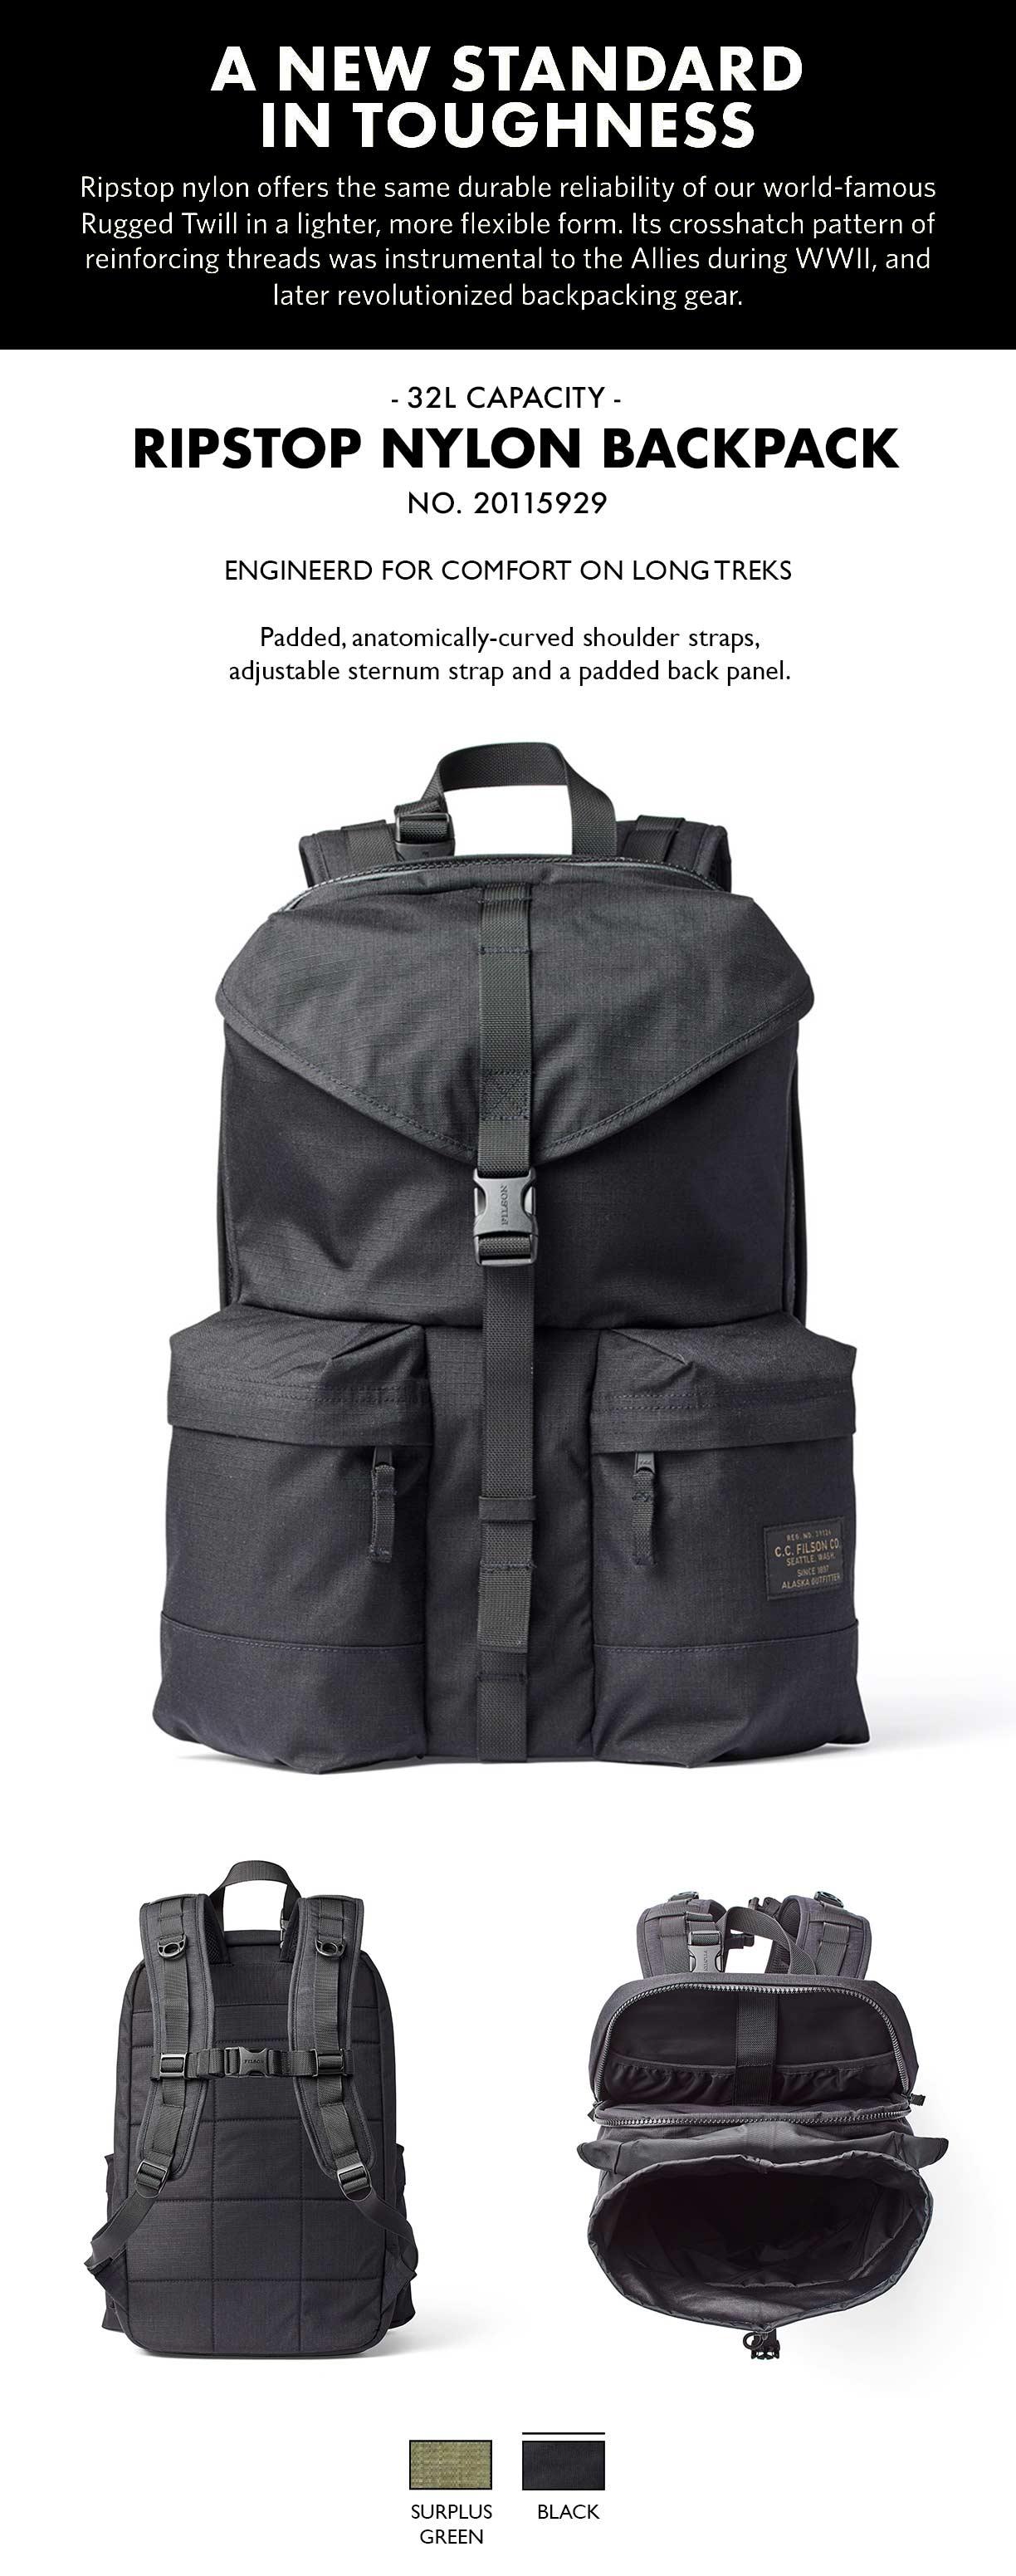 Filson Ripstop Backpack Surplus Green Produkt-informationen